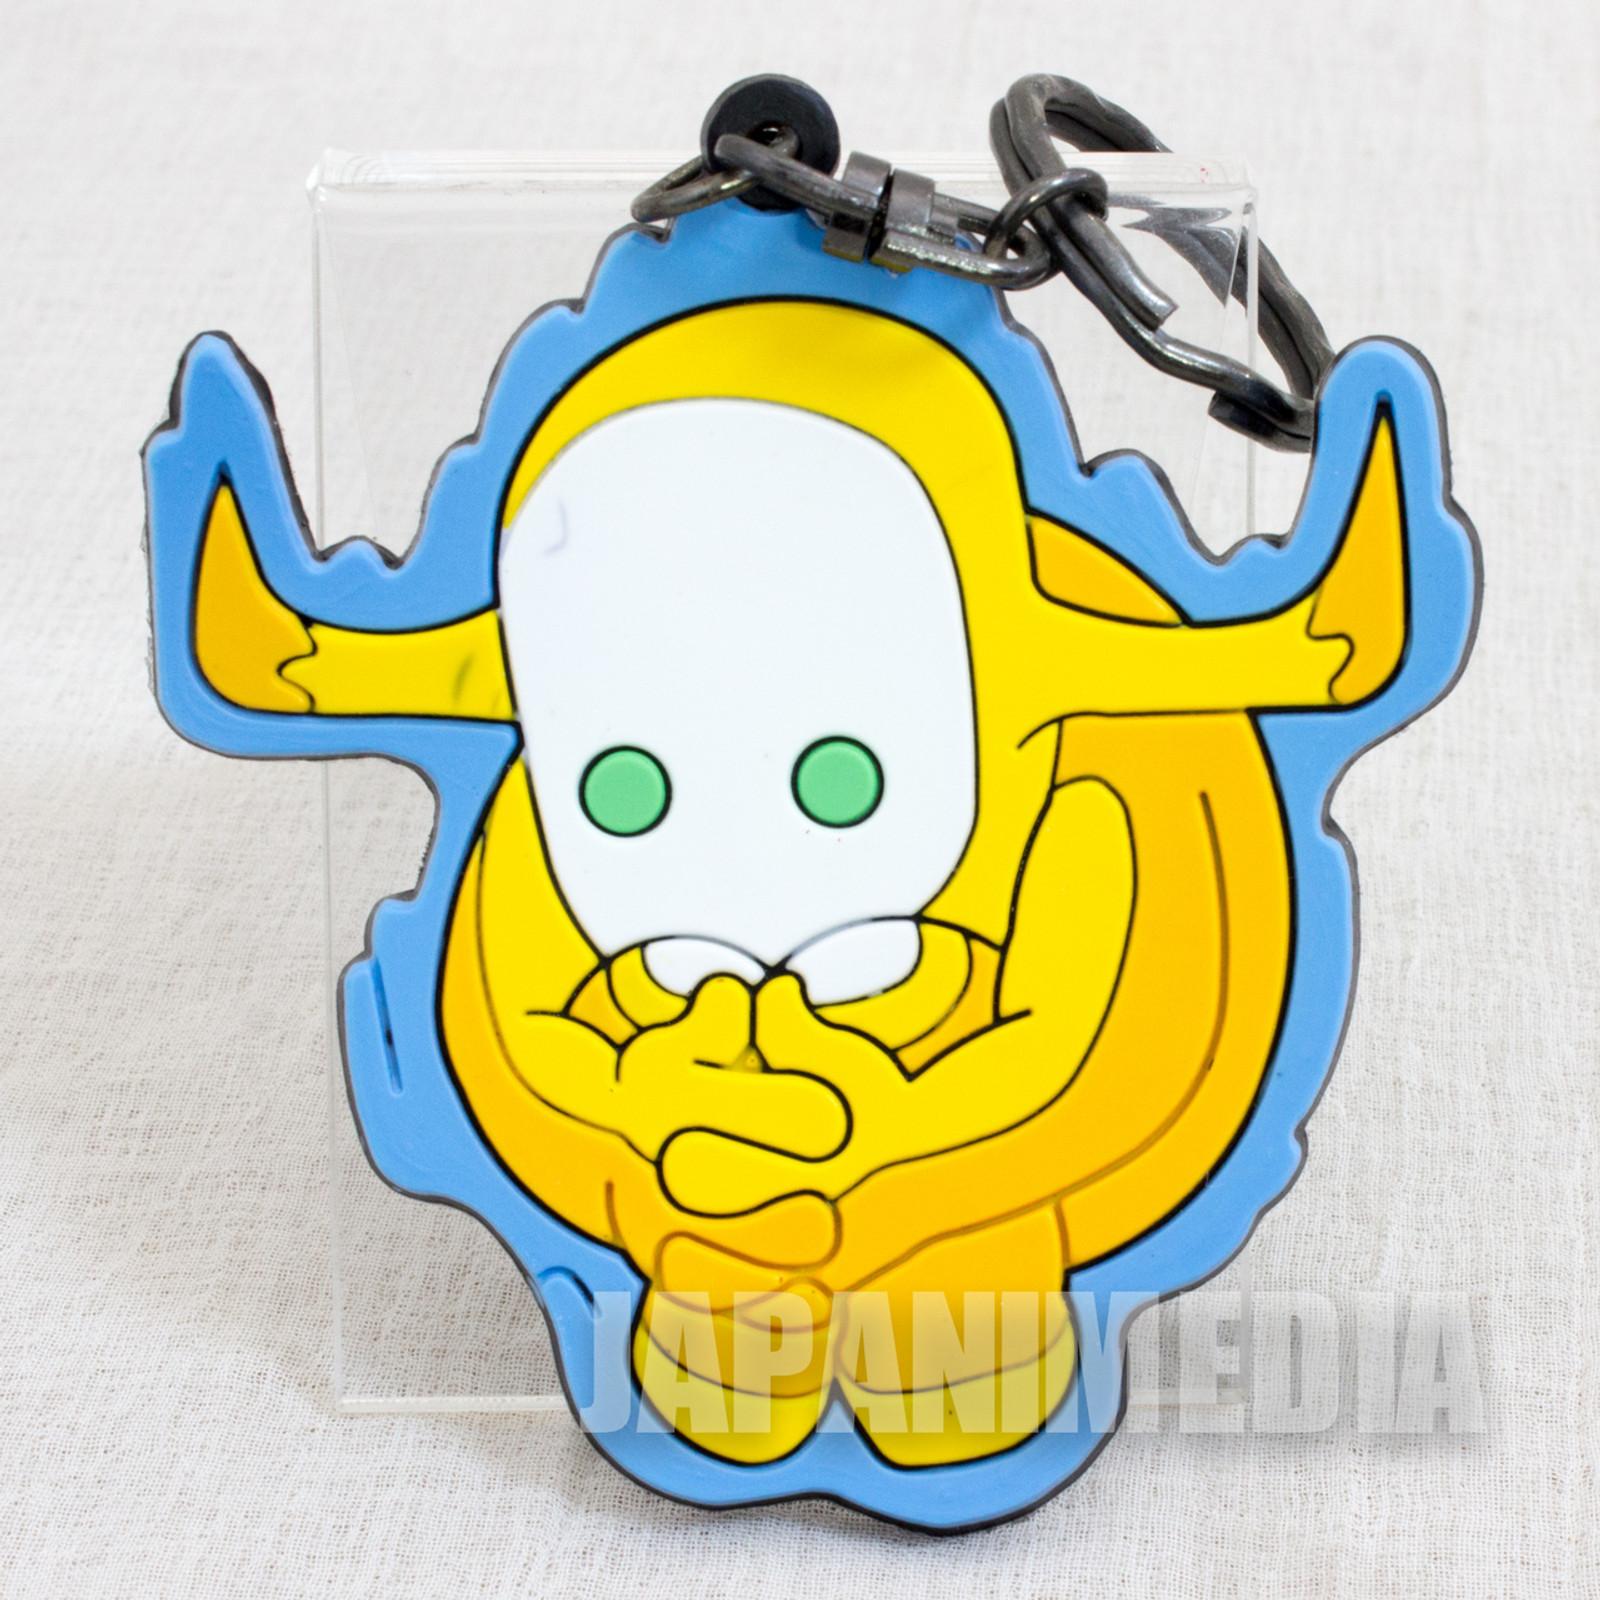 Darkstalkers (Vampire) Pyron Rubber Mascot Keychain Capcom